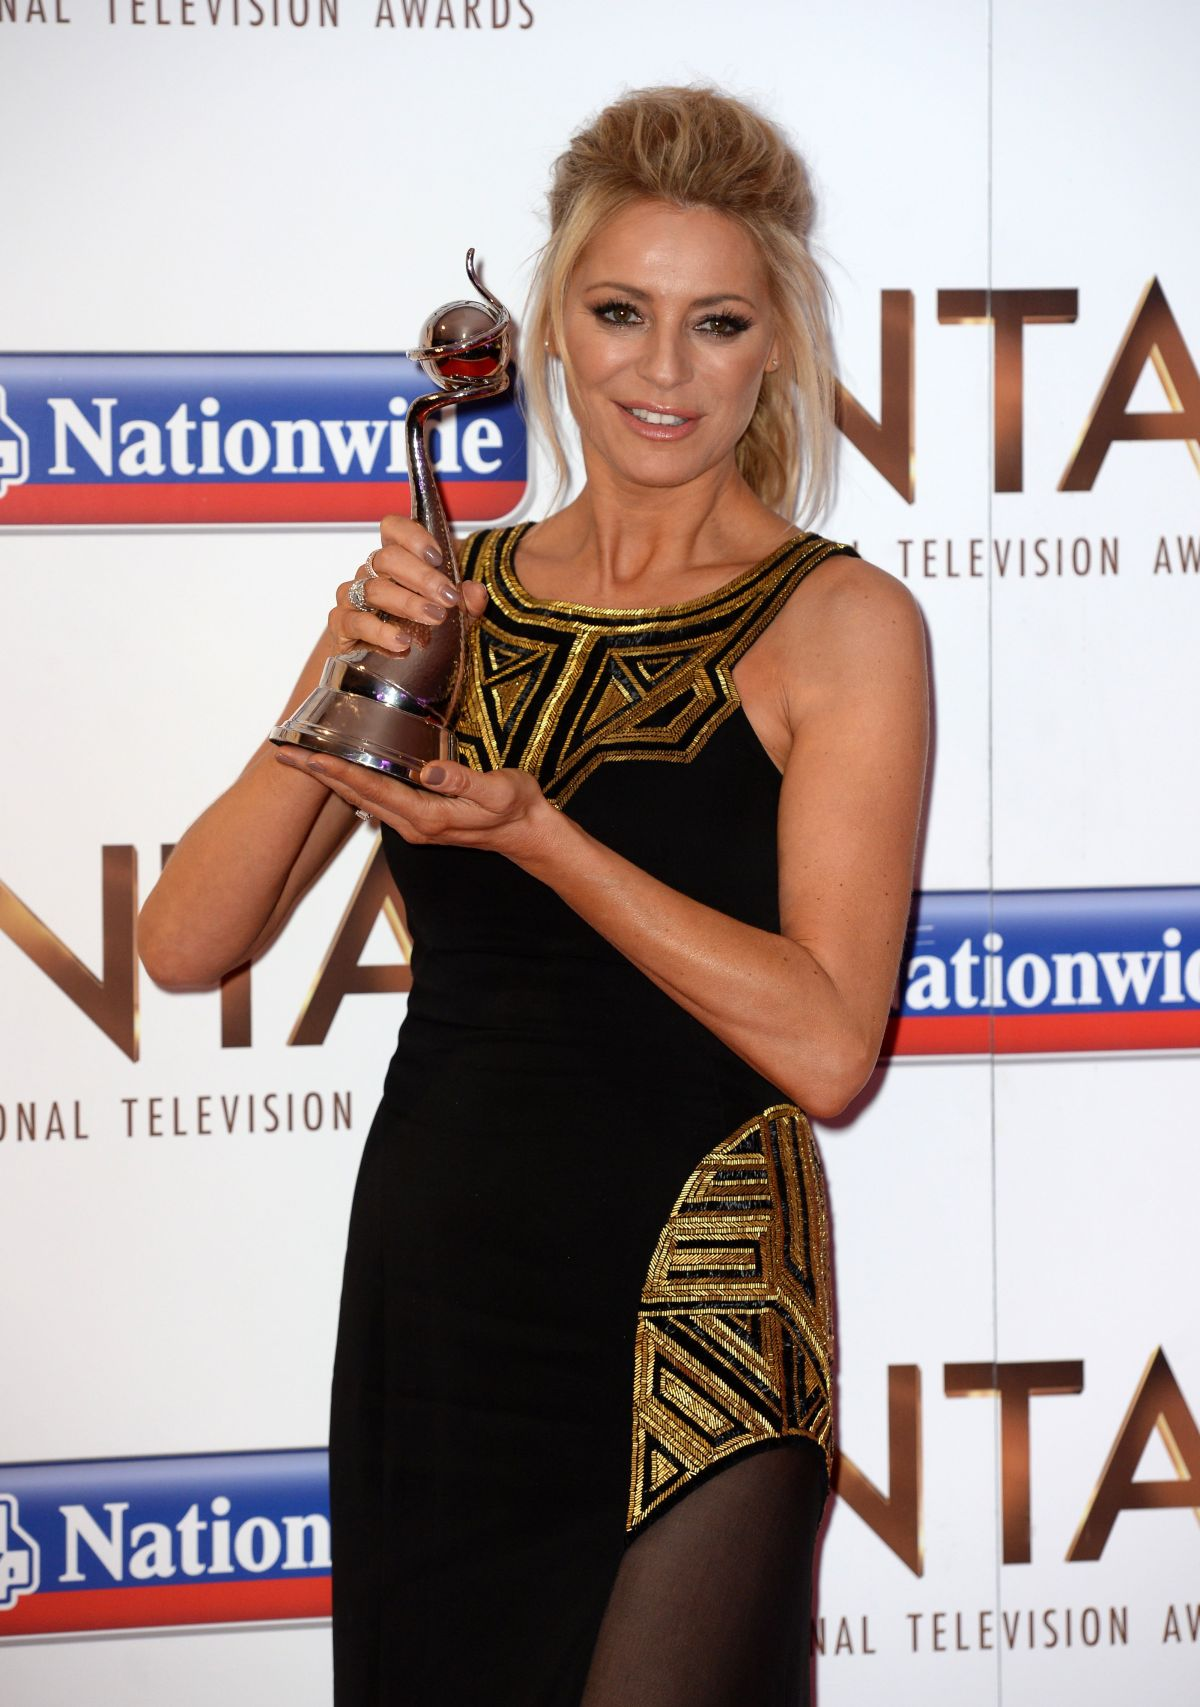 TESS DALY at 2016 National Television Awards in London 01/20/2016